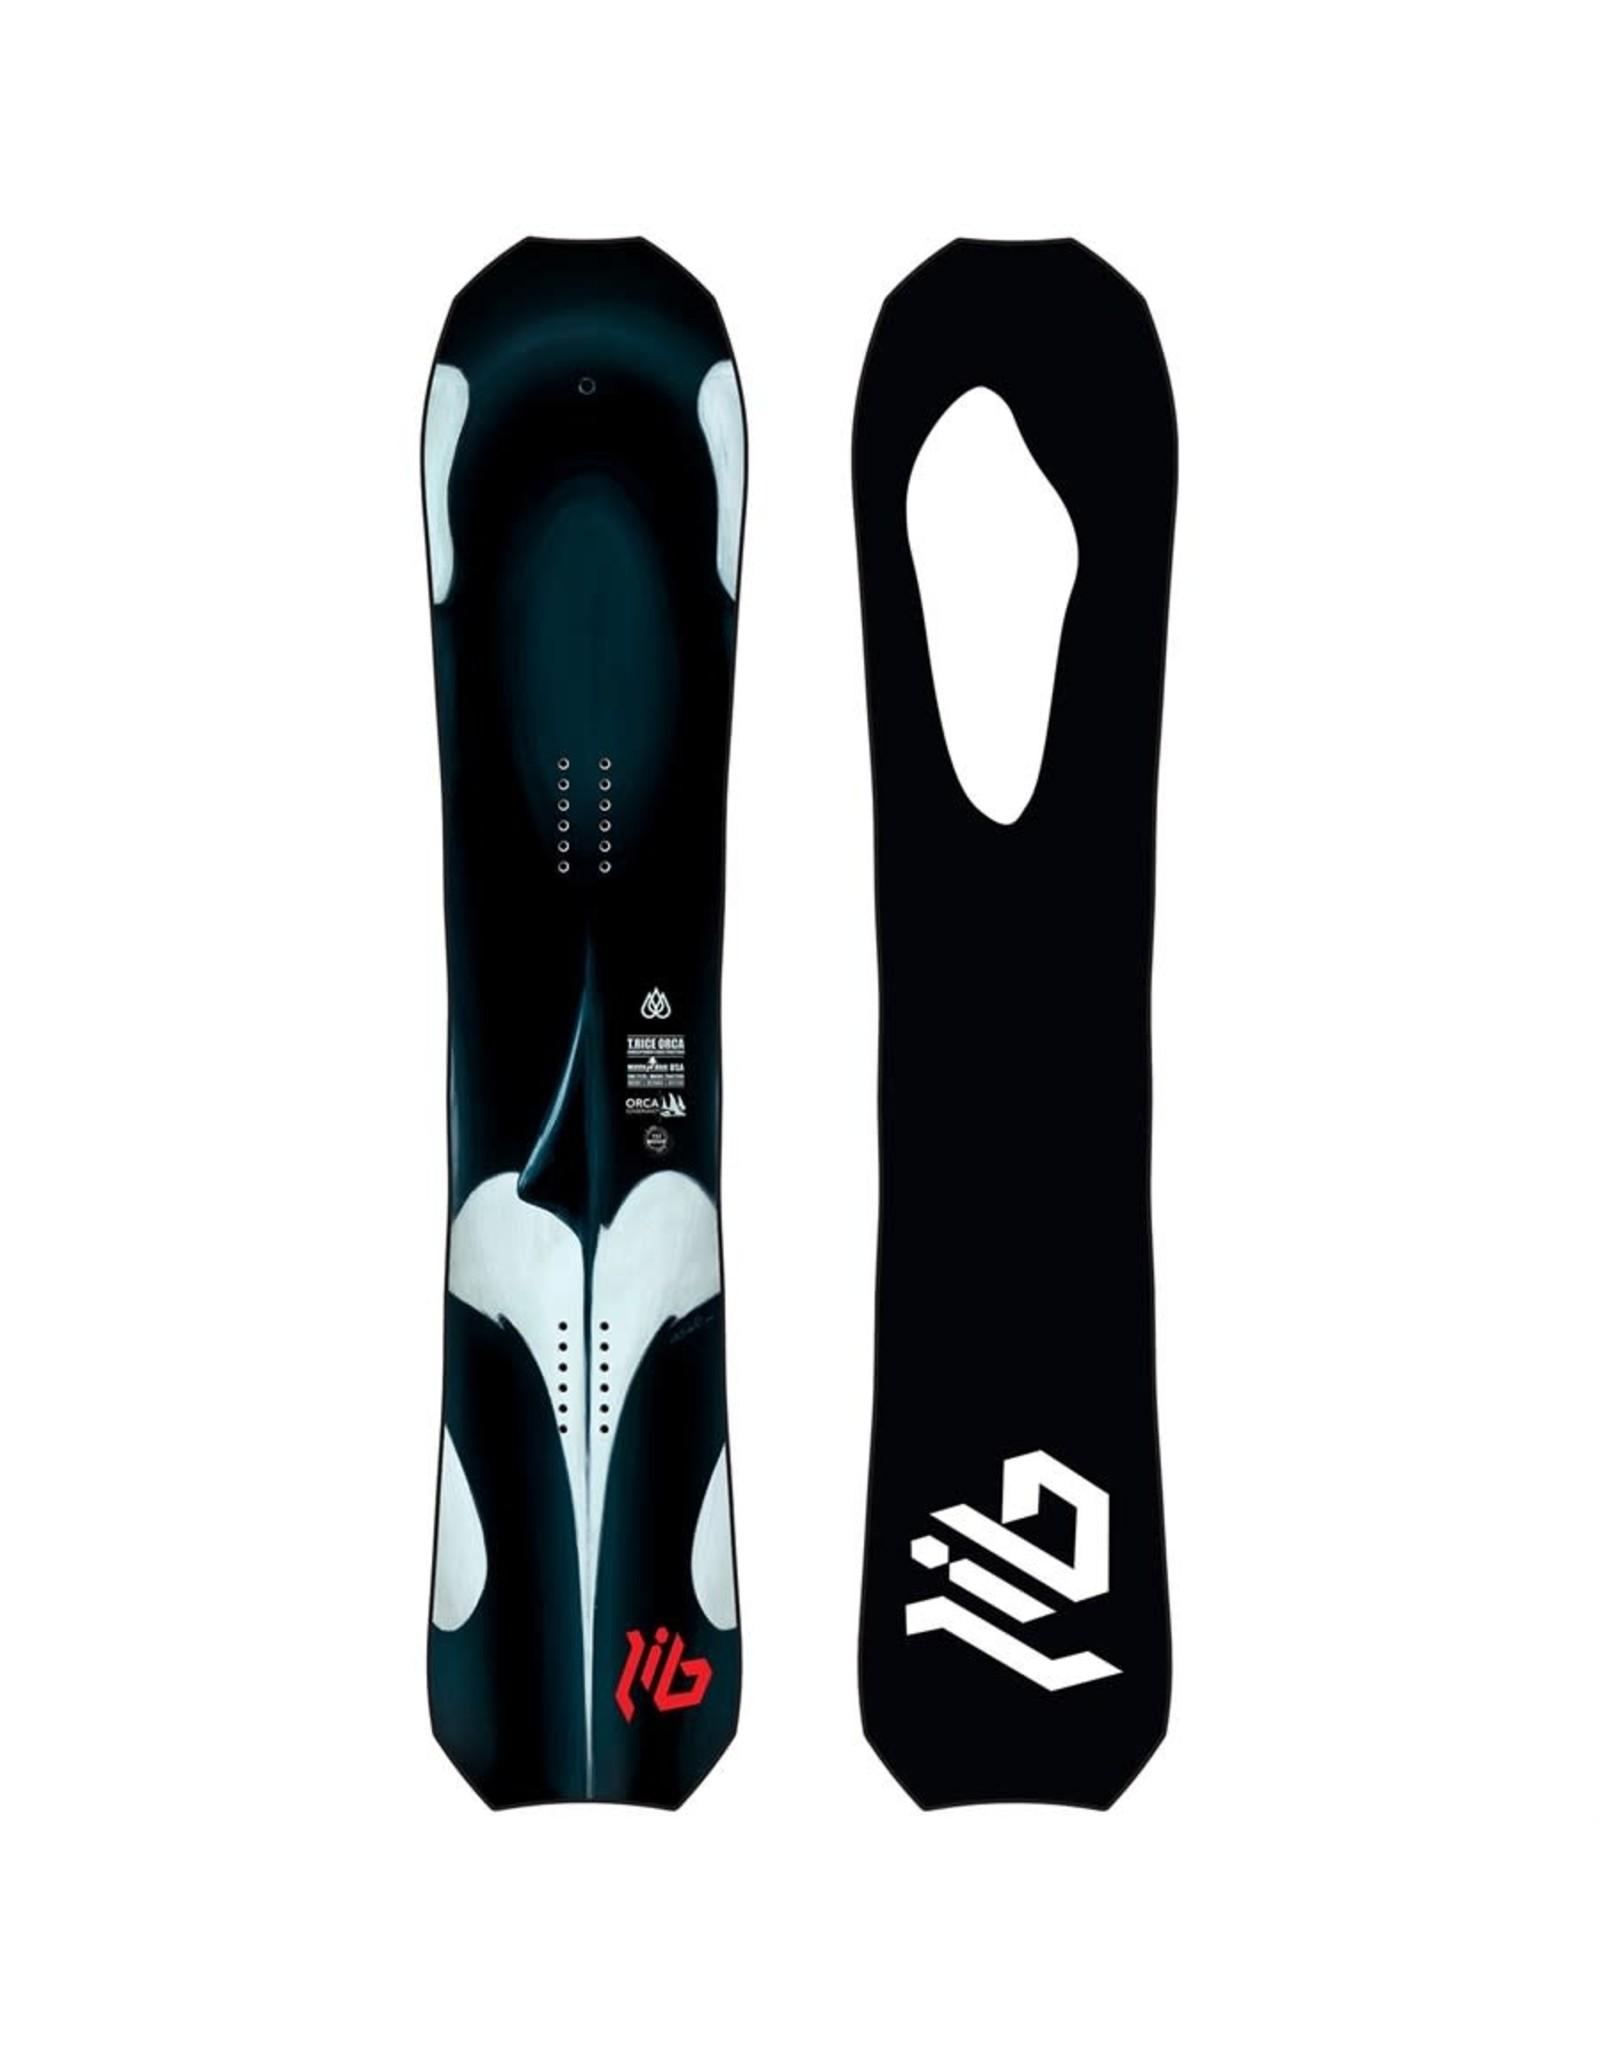 lib technologies Lib Technologies  - Snowboard travis rice orca